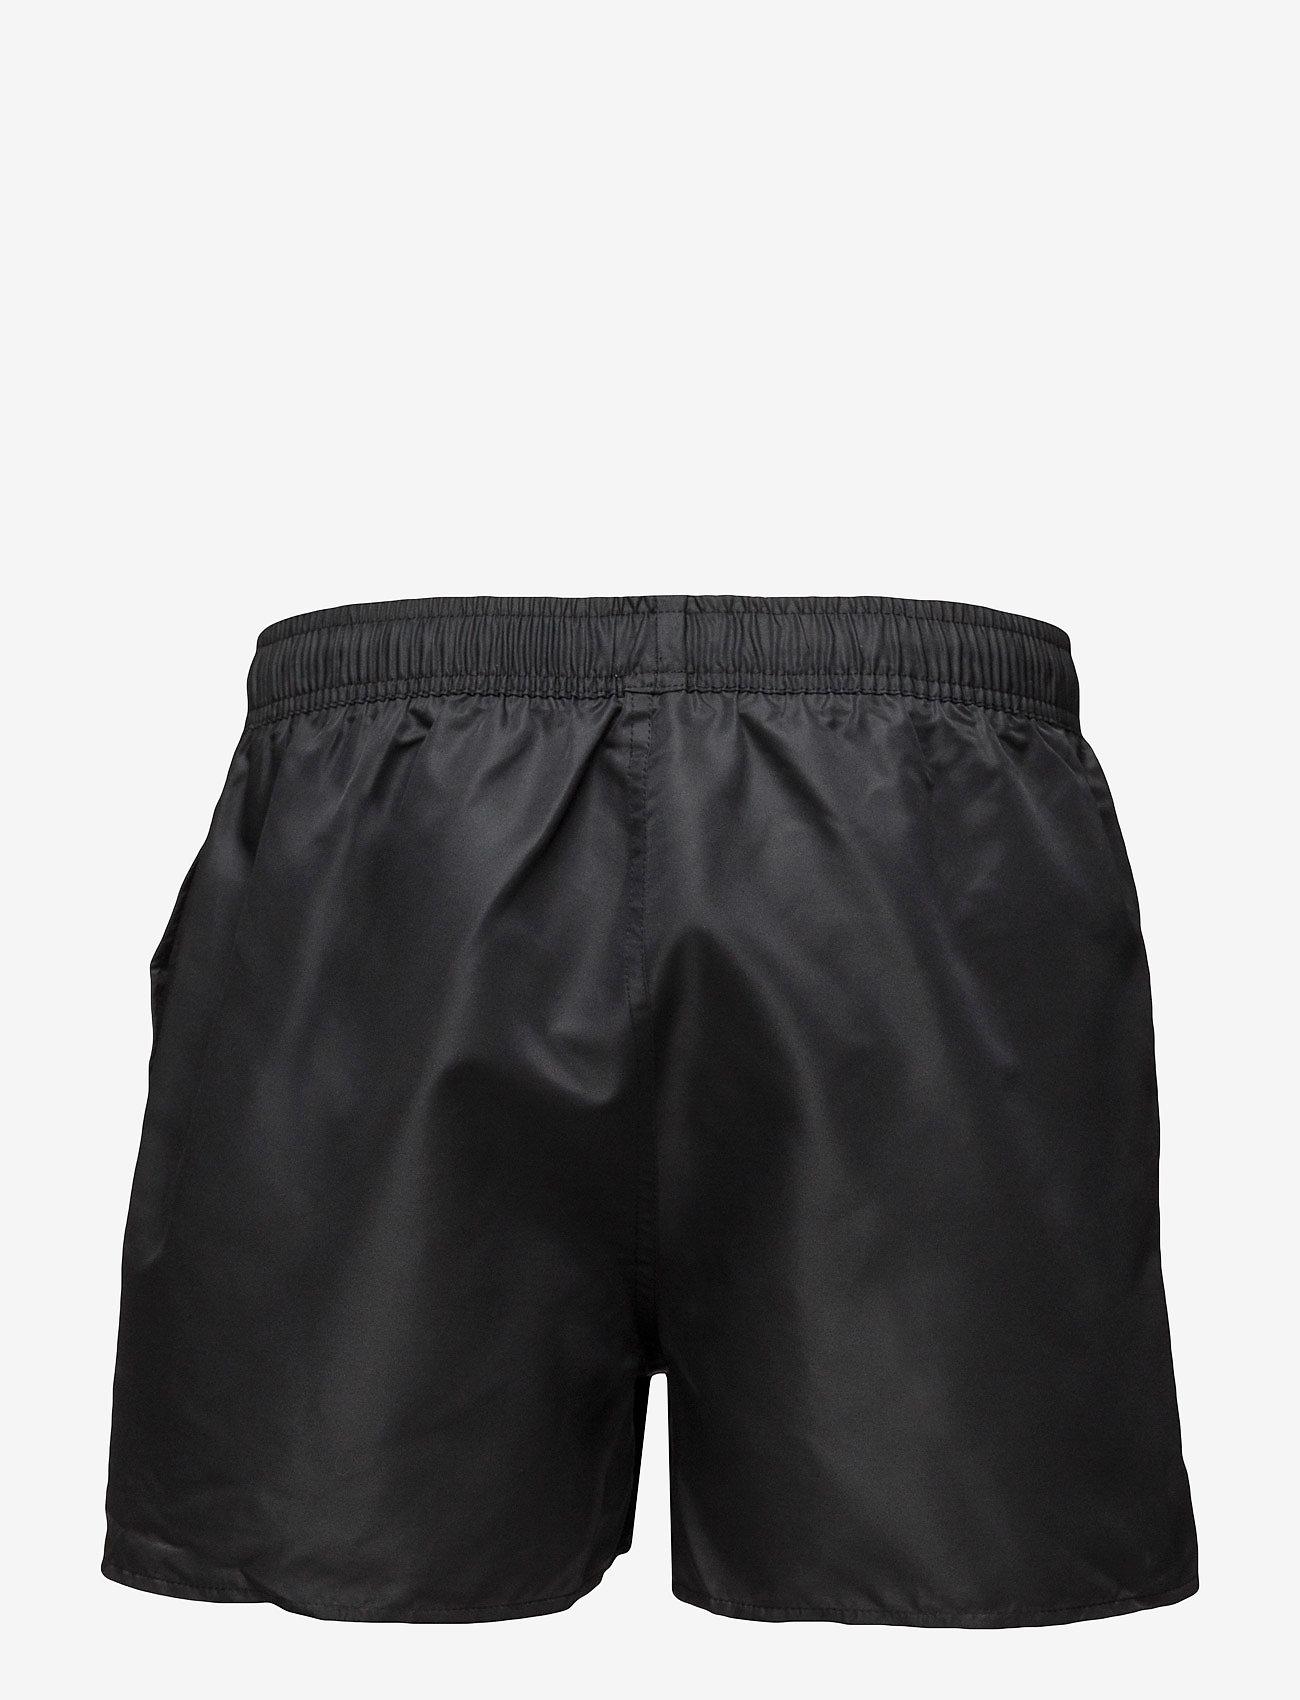 Resteröds Swimwear - Badetøy BLACK - Menn Klær